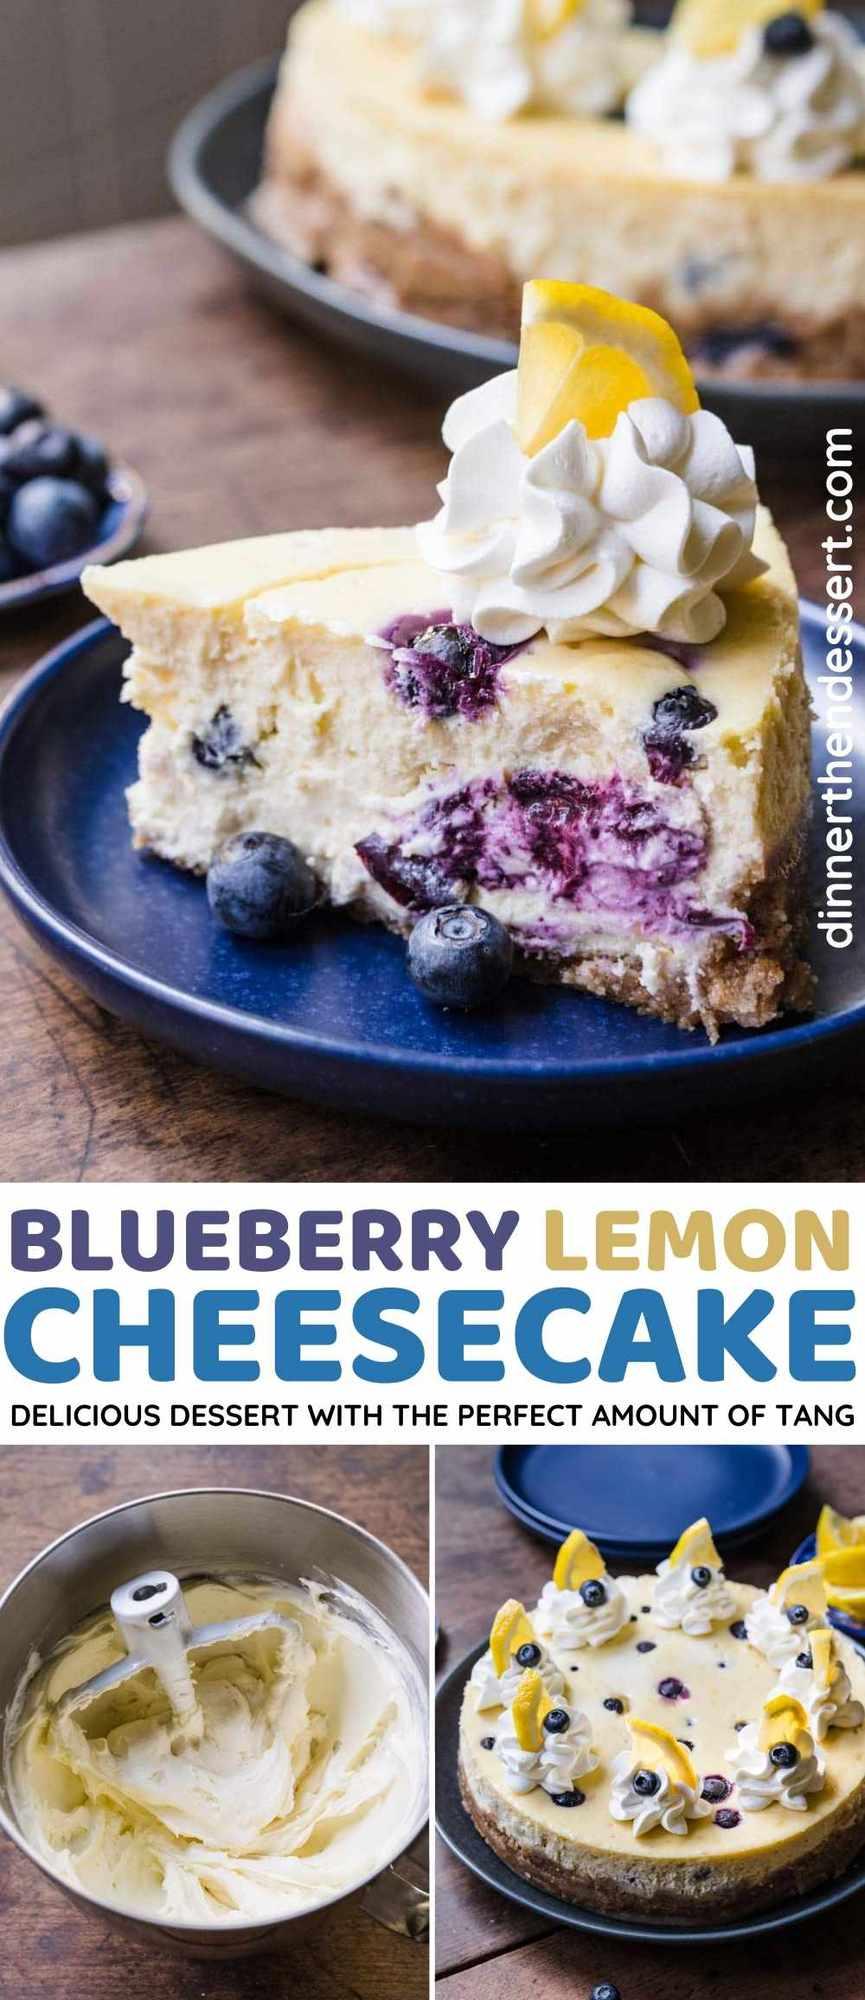 Blueberry Lemon Cheesecake collage